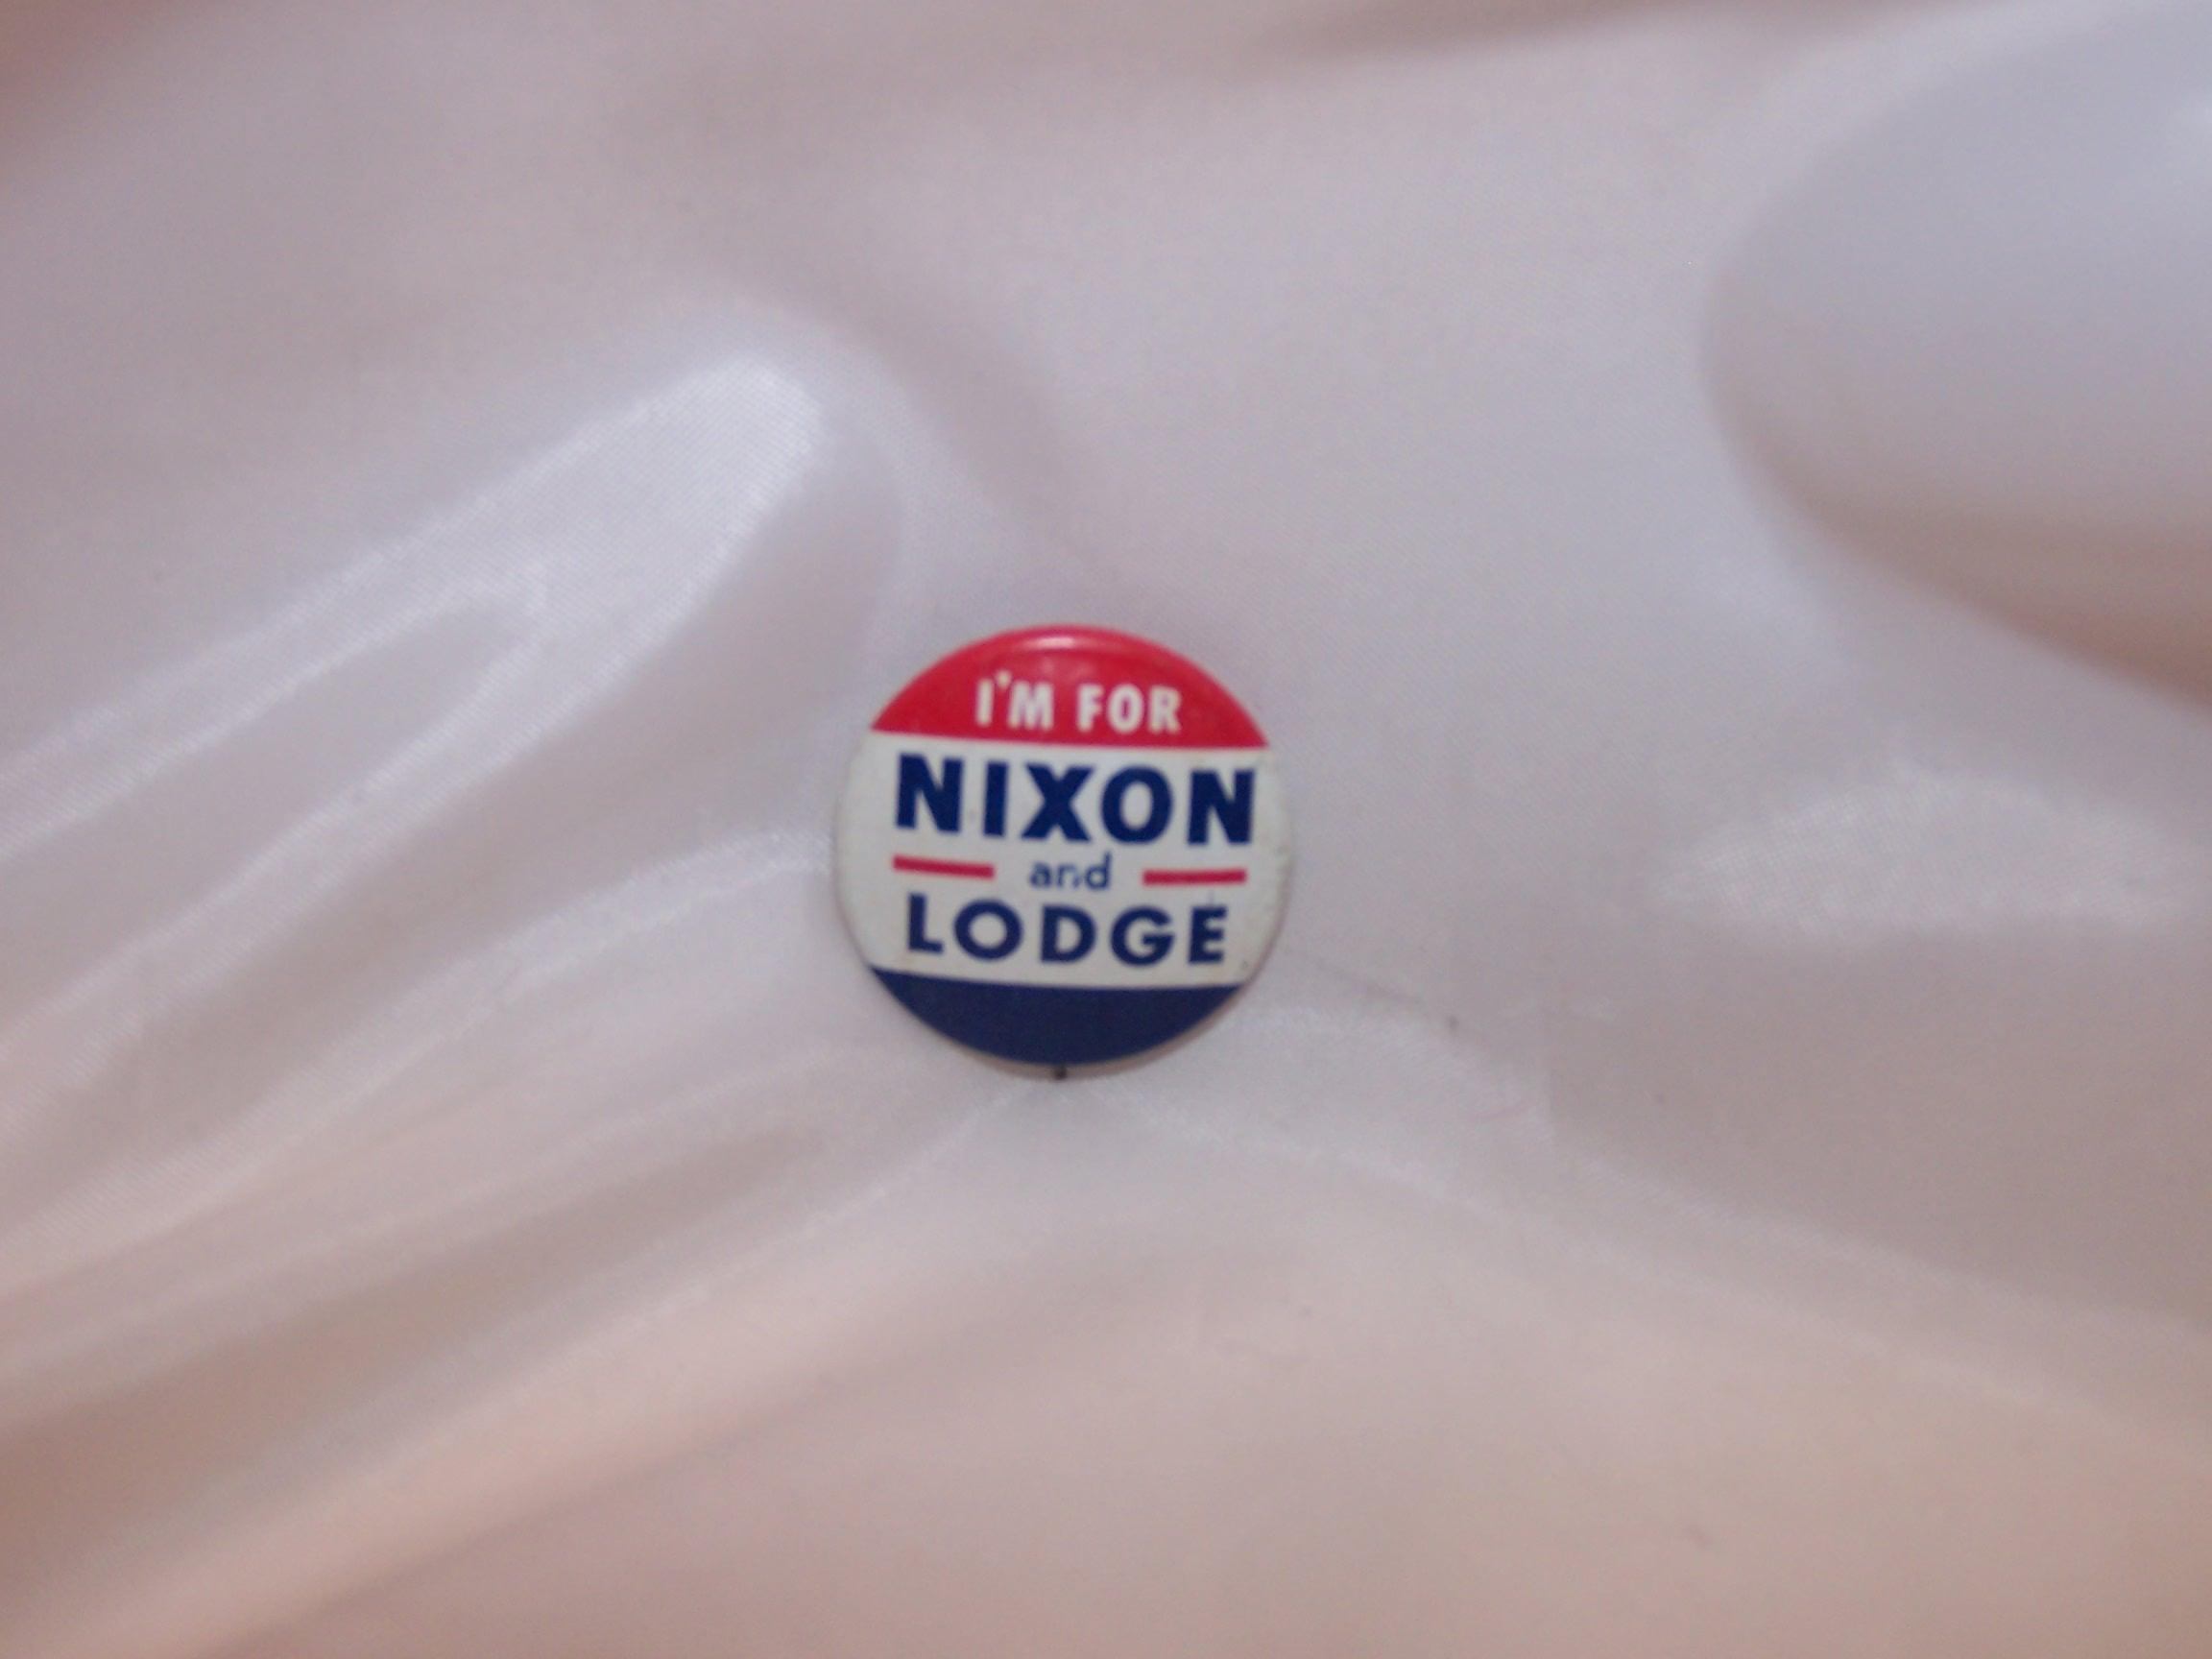 I'm For Nixon and Lodge Election Pin, Button, Original